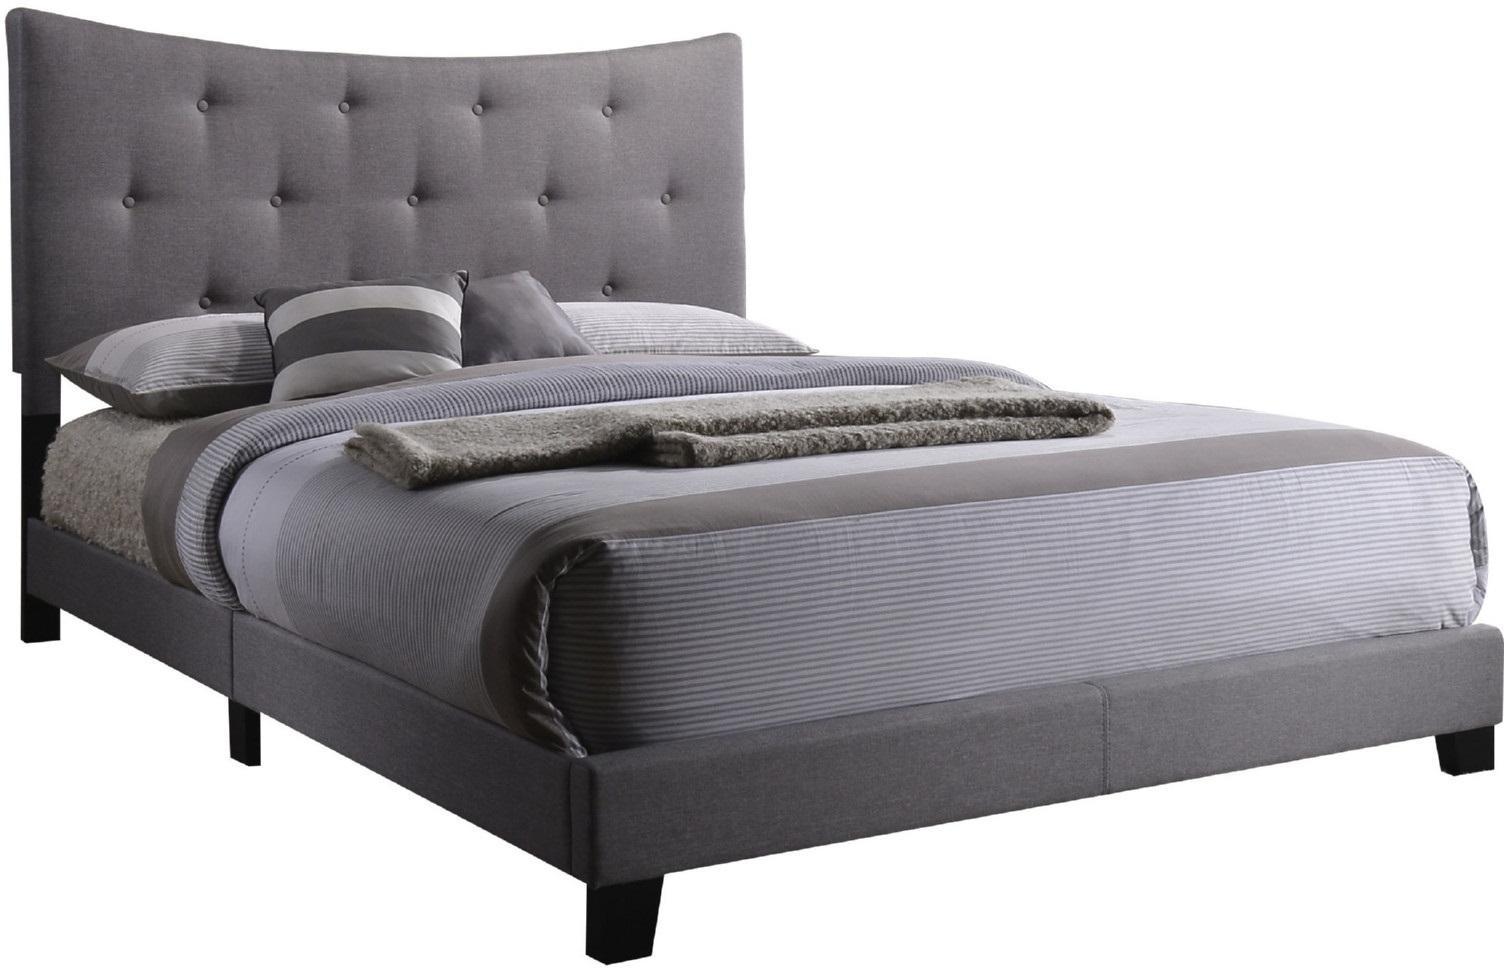 "83"" X 64"" X 48"" Queen Gray Fabric Bed"